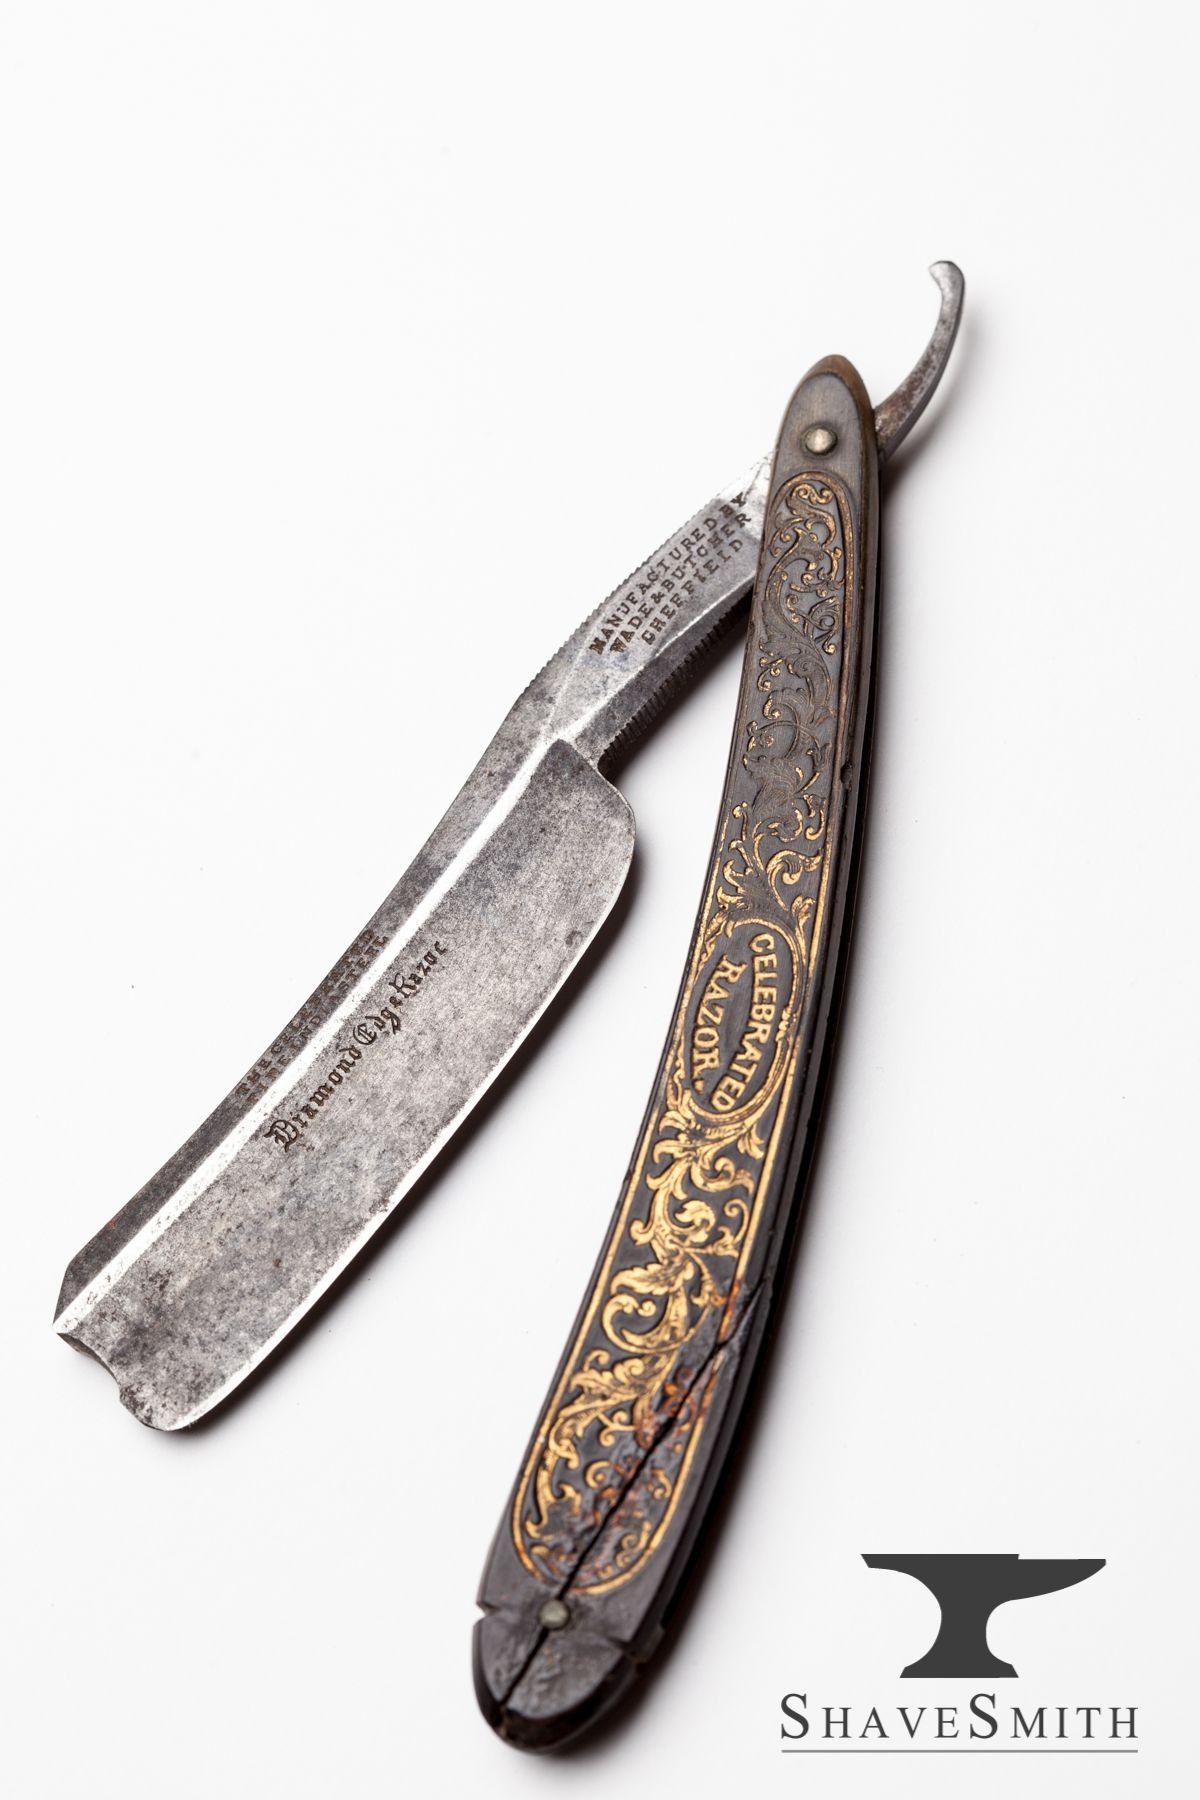 The Old Britva Mens Grooming Vintage Straight Razors